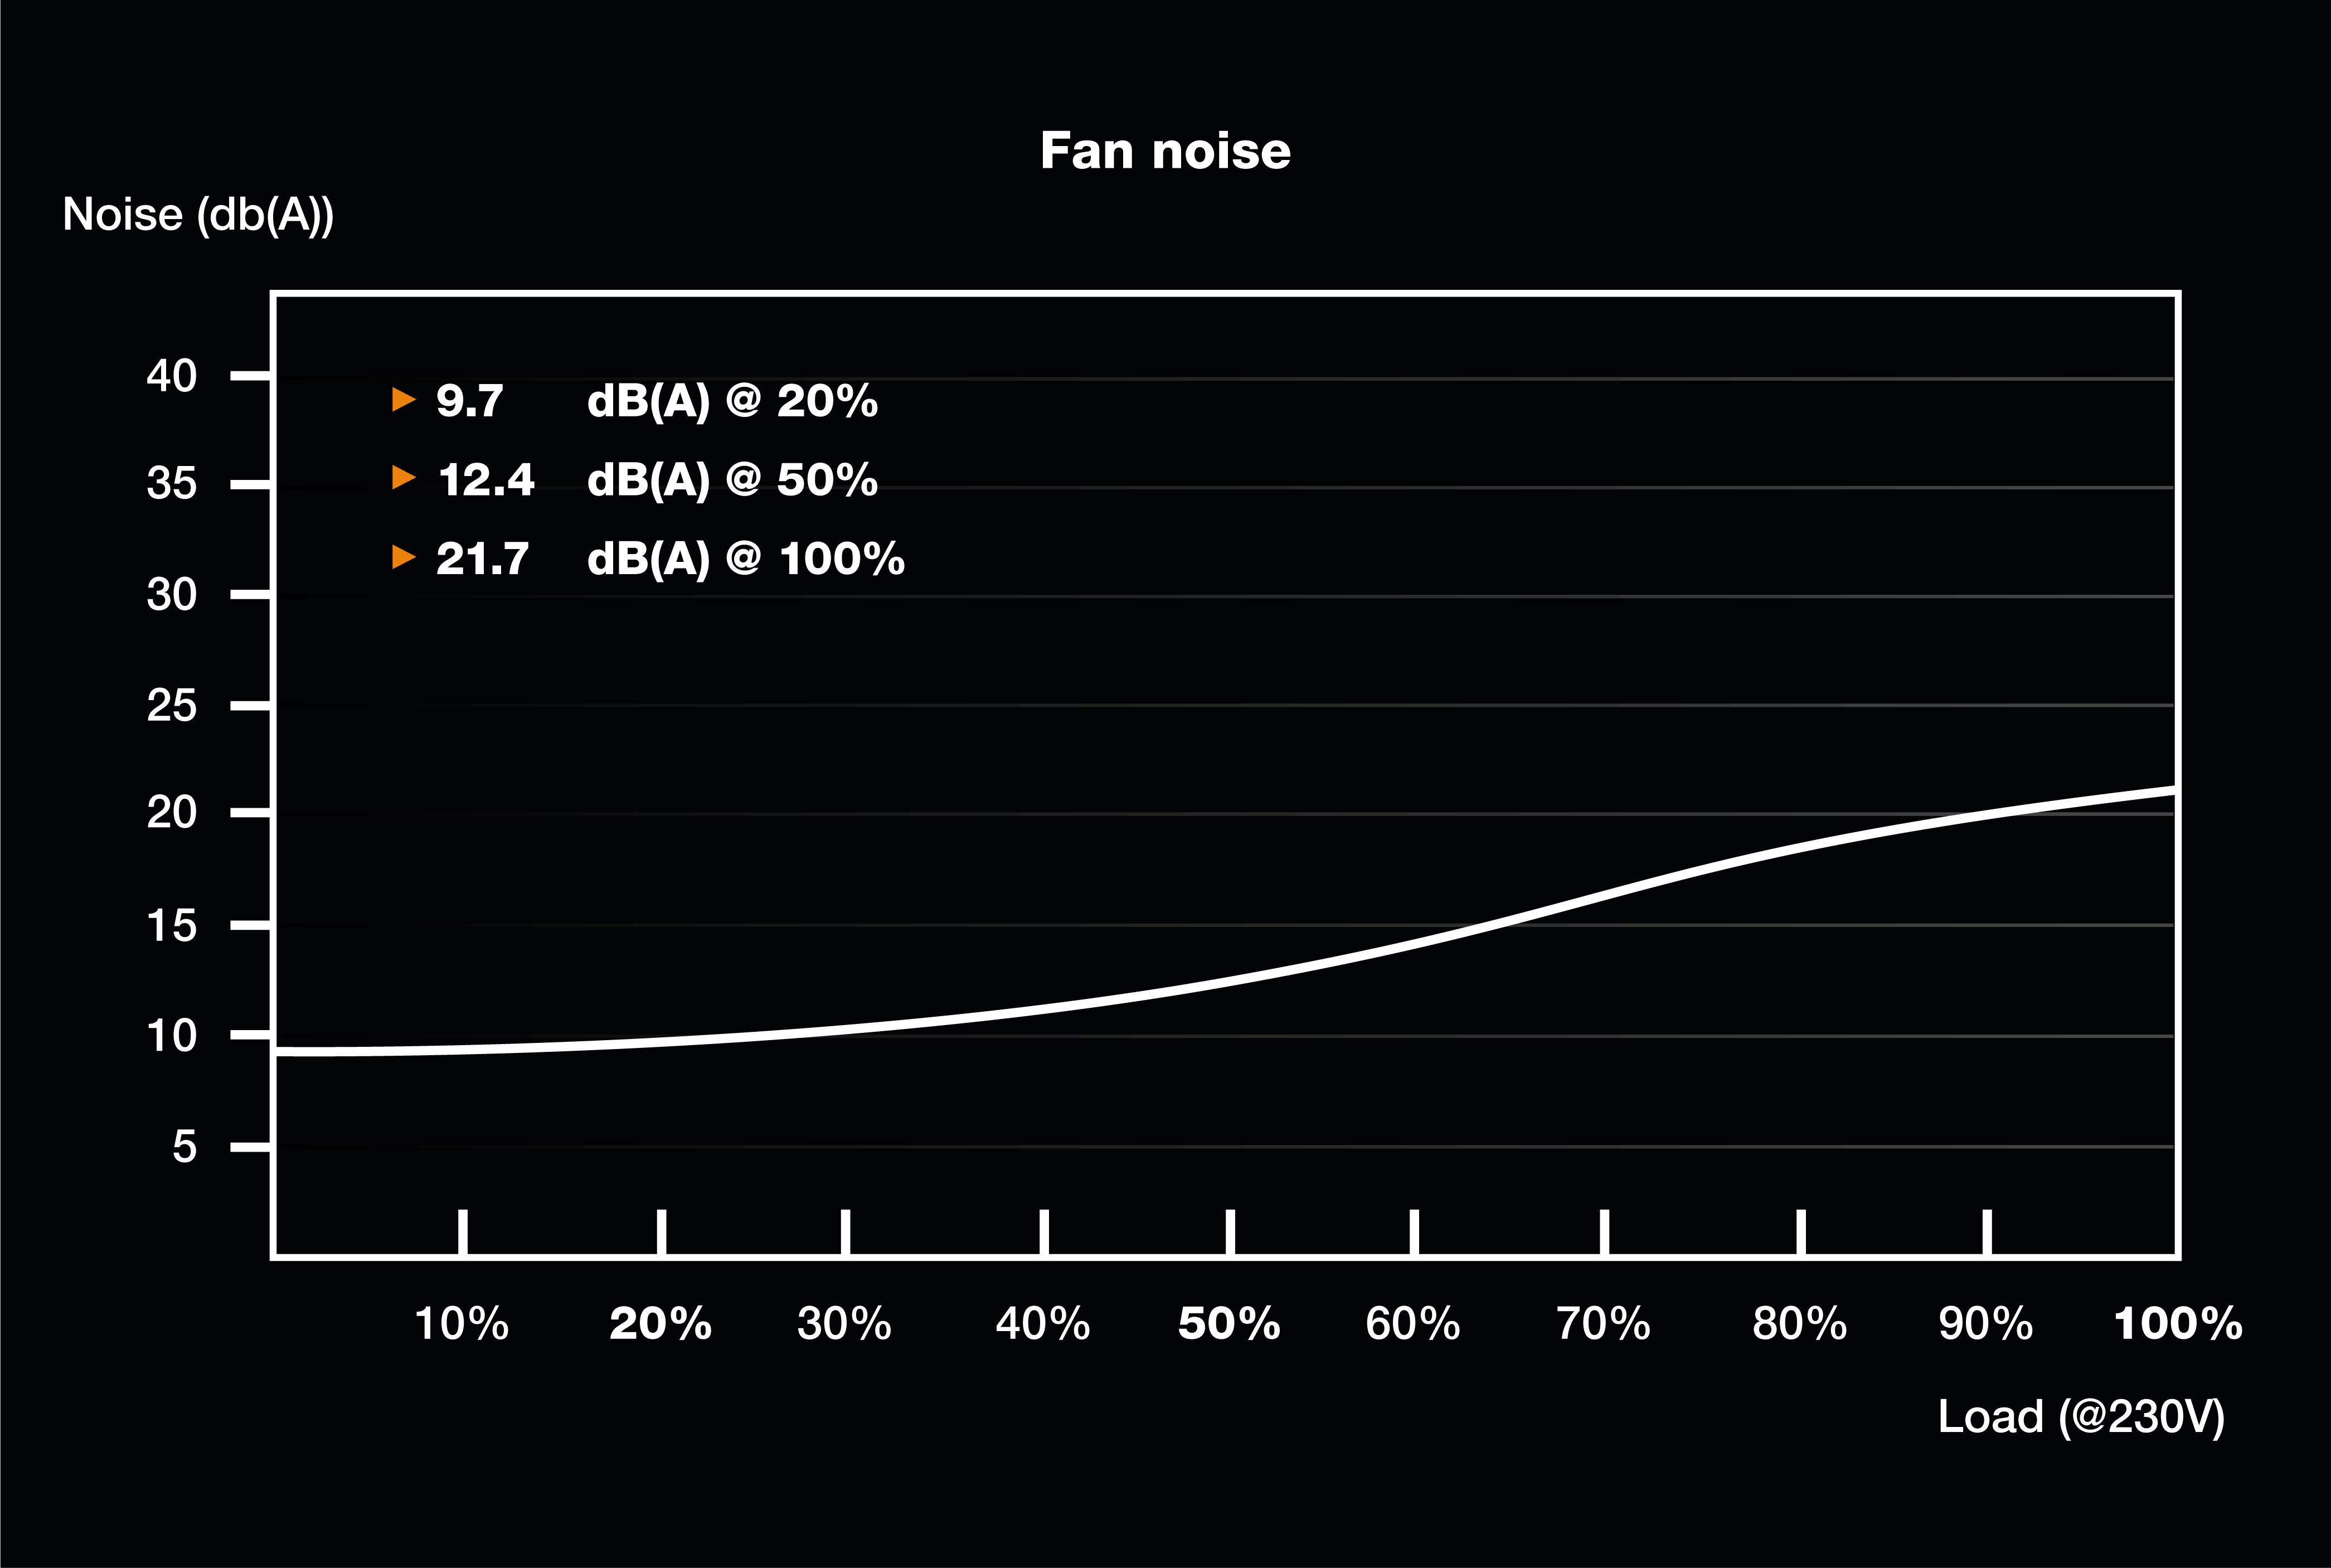 be quiet! TFX Power 3 300W, 80+ Gold, ErP, Energy Star 8 APFC, Sleeved, 2xPCI-Ex, 3xSATA, 2xPATA, 80 mm fan, Dual 12V Rails